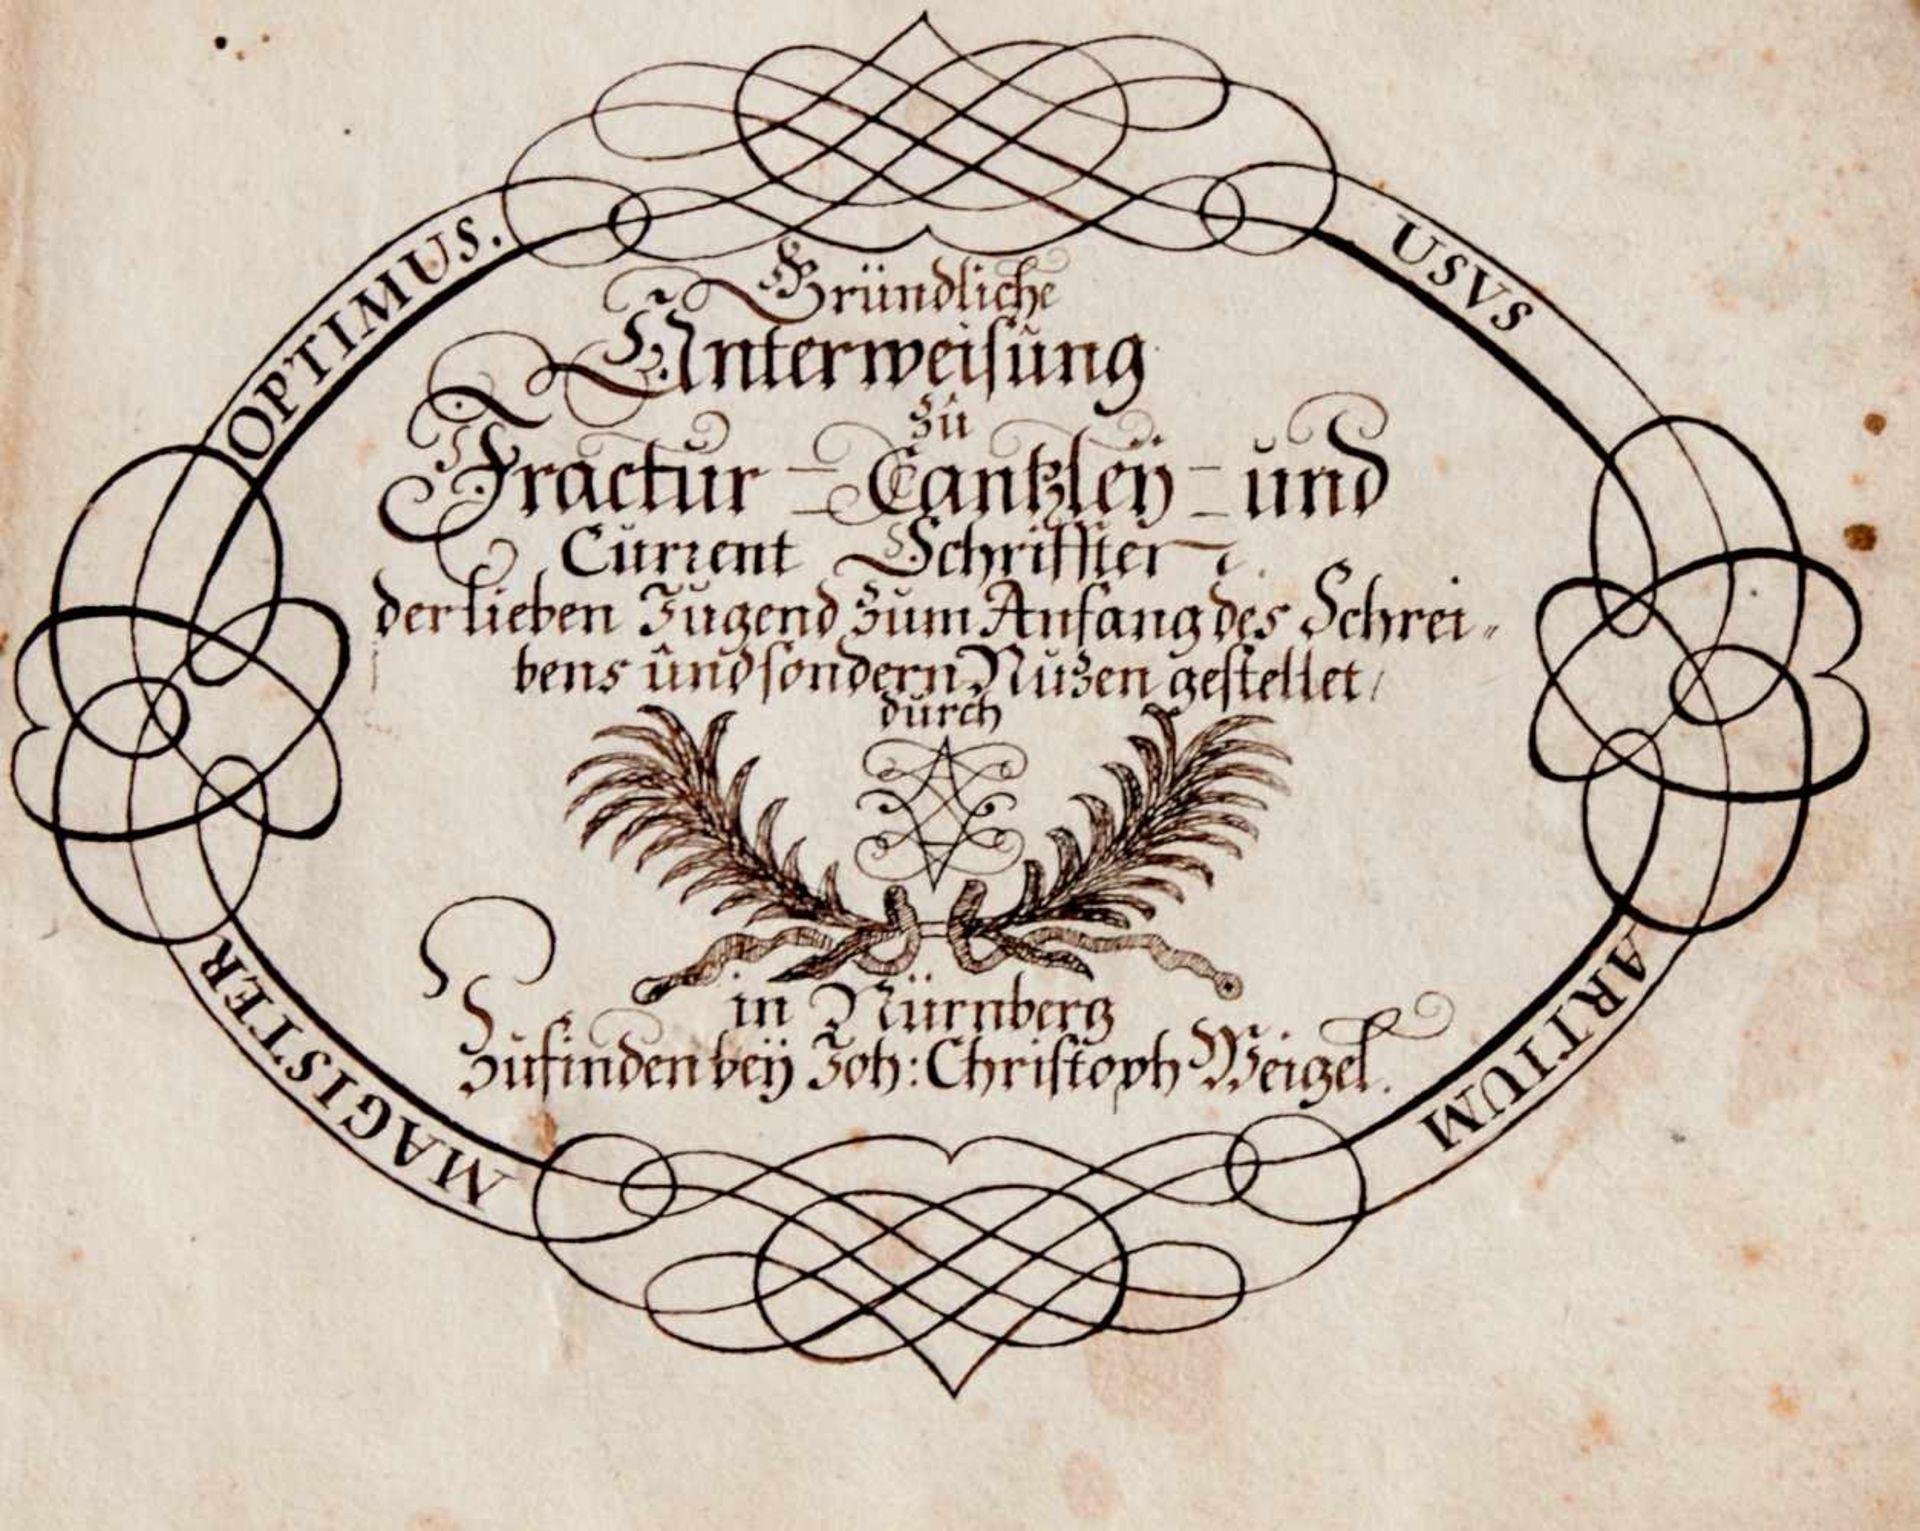 Schreibmeisterbuch - Abschrift des seltenen, um 1713 inNürnberg bei Johann Christoph Weigel - Bild 2 aus 5